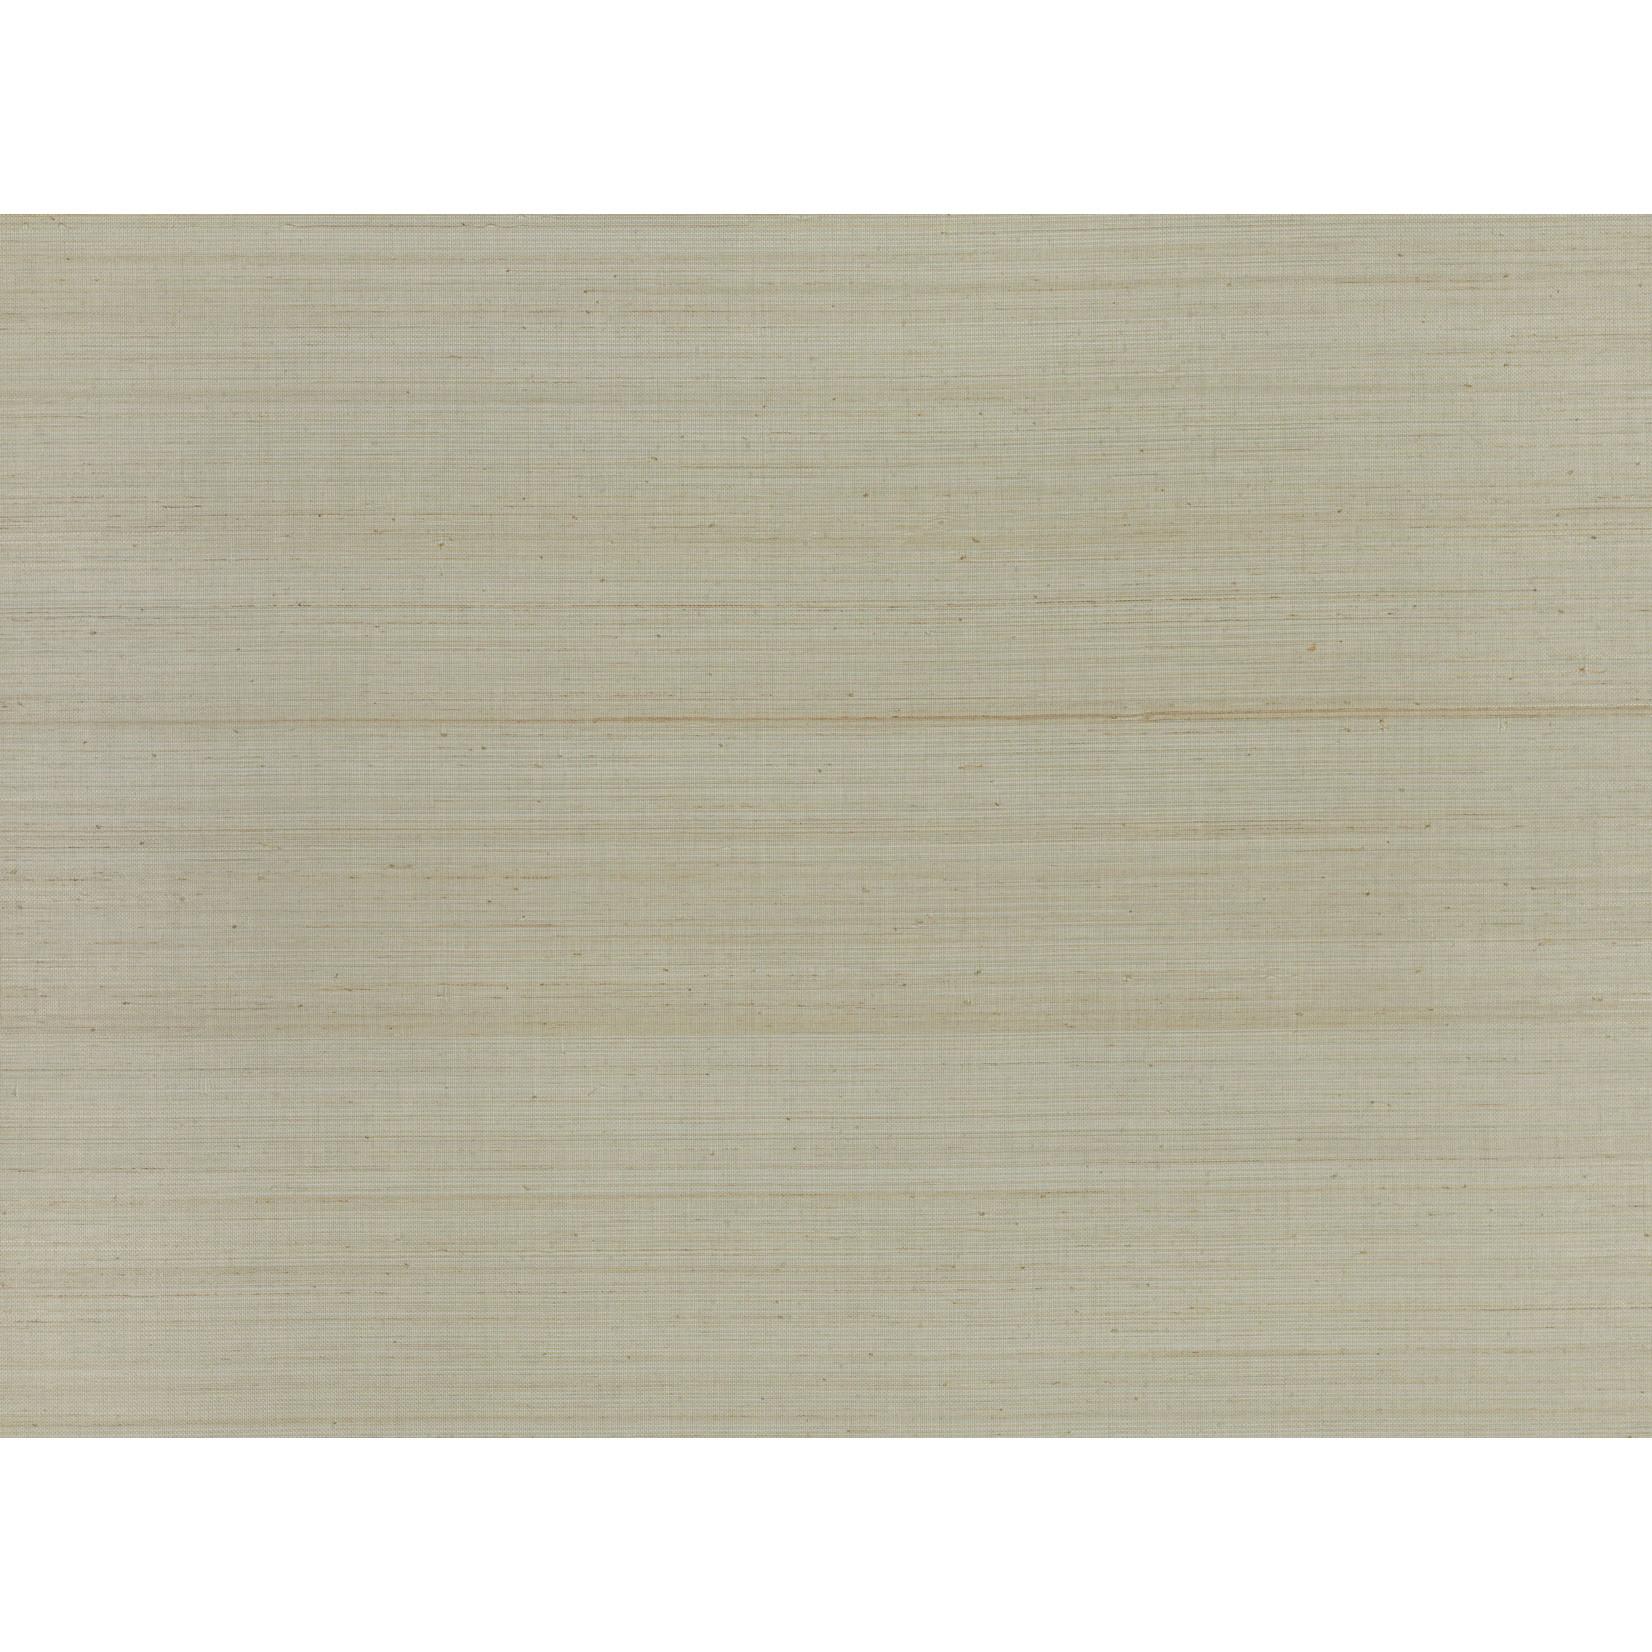 Mark Alexander Grasscloth Handwoven Wallcoverings | Abaca Powder